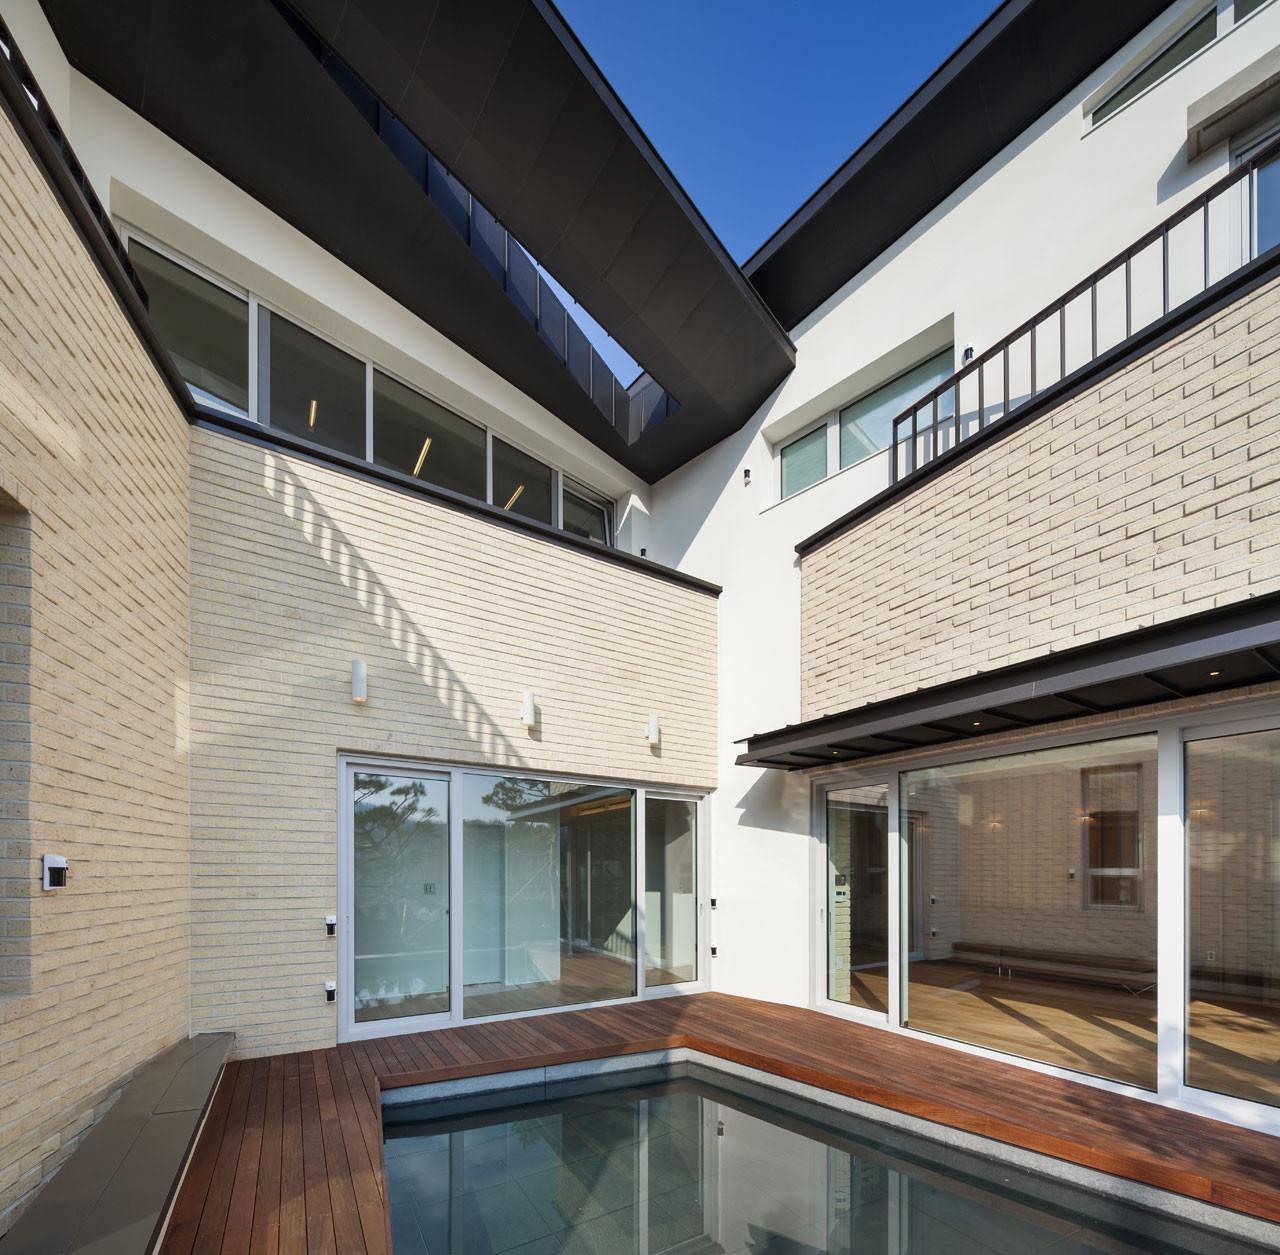 Gallery of naegok v house jhy architect associates 3 for Architect associates